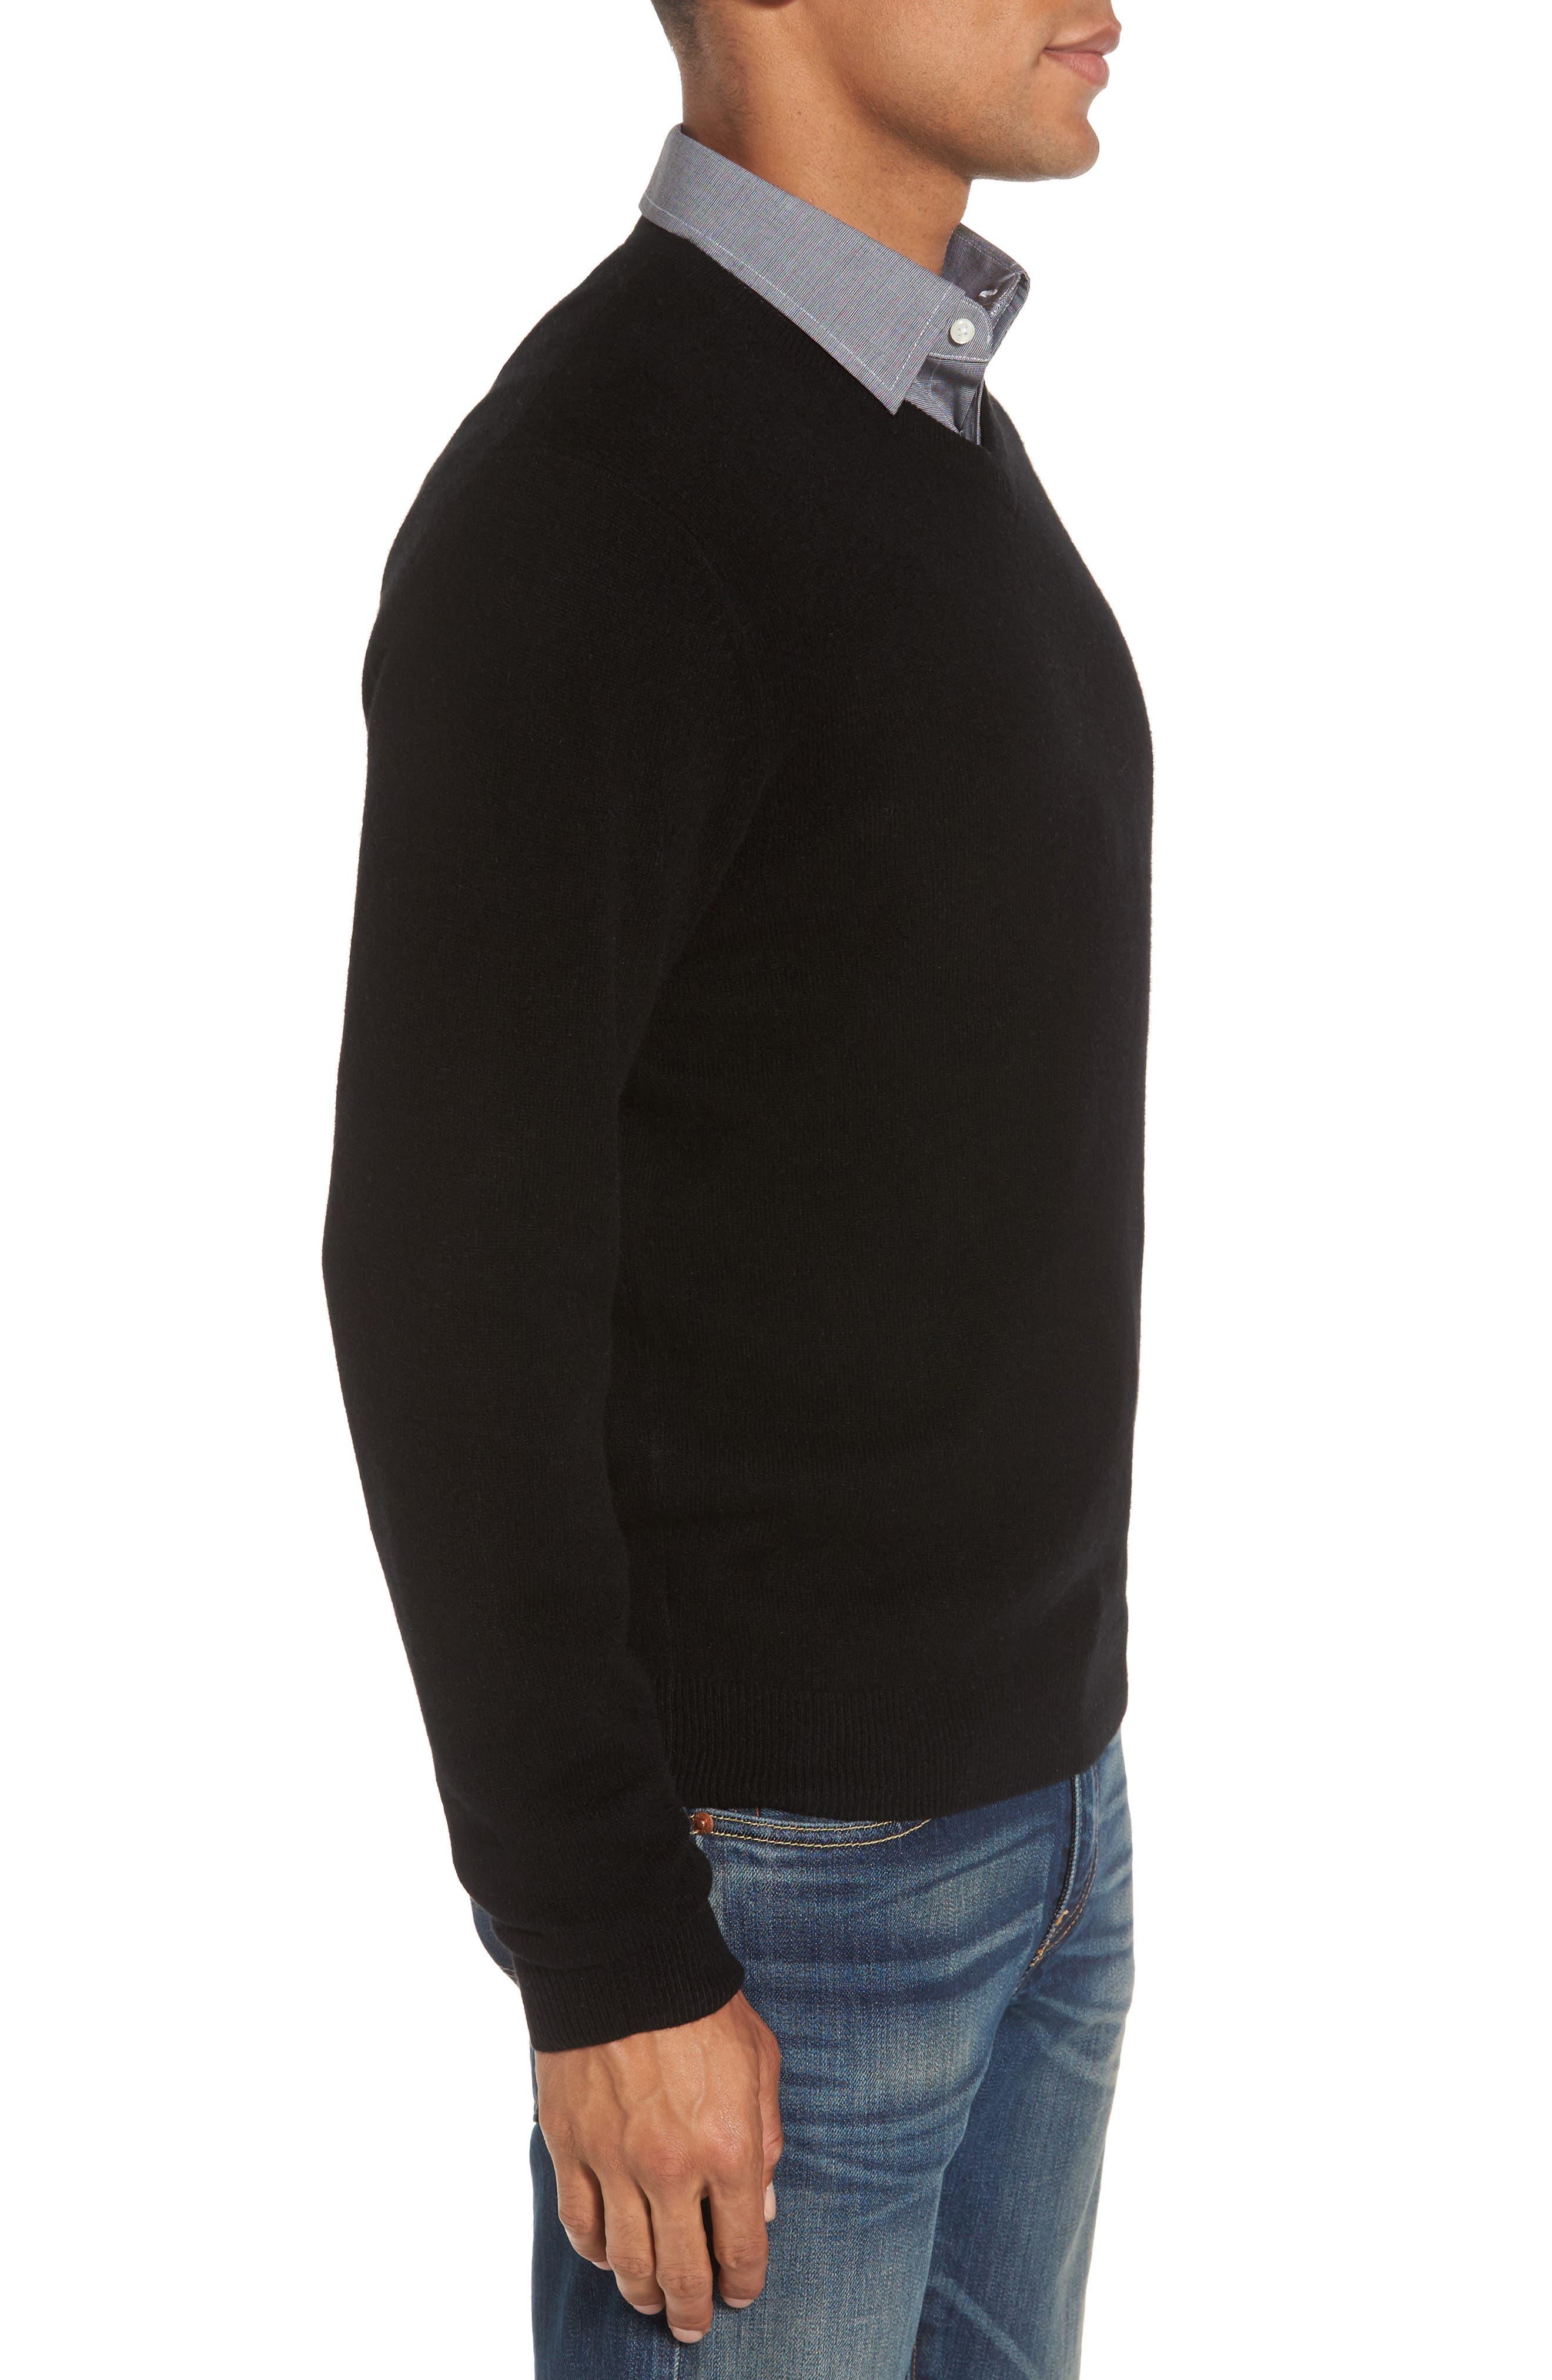 NORDSTROM MEN'S SHOP,                             Cashmere V-Neck Sweater,                             Alternate thumbnail 3, color,                             BLACK CAVIAR